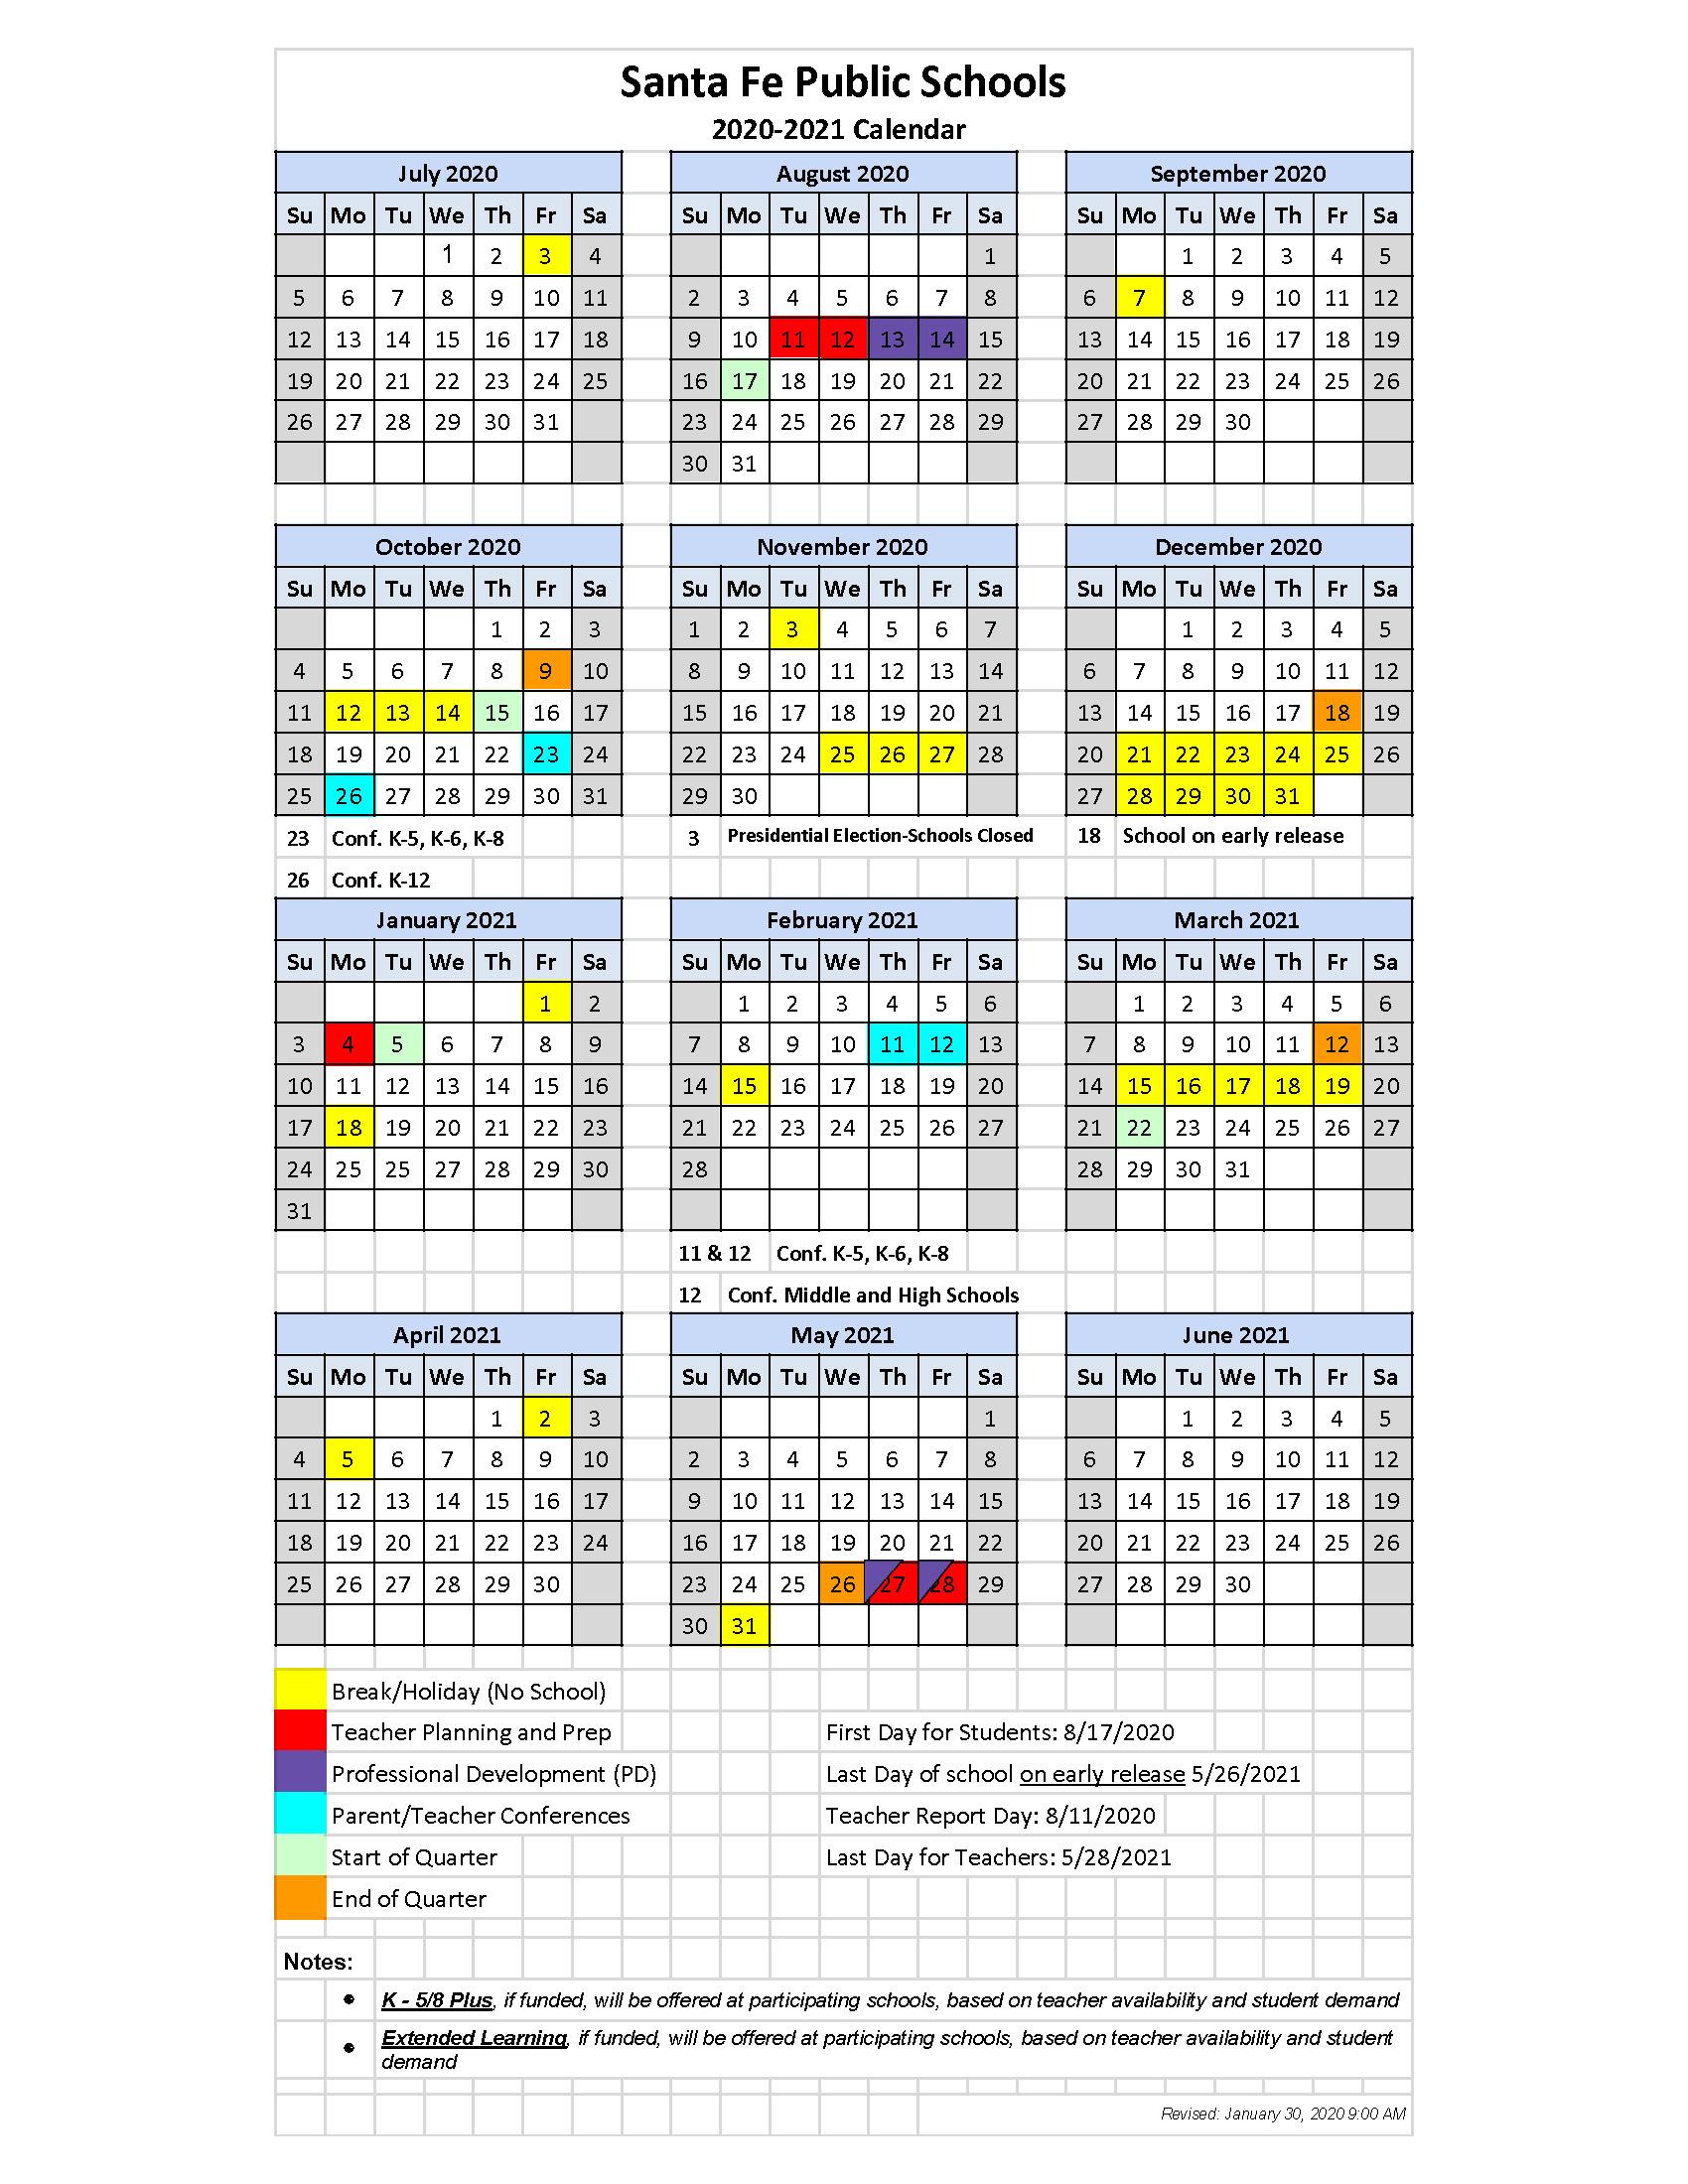 What's New – Ramirez Thomas Elementary Throughout Dos Pueblos High School Calendar 2021